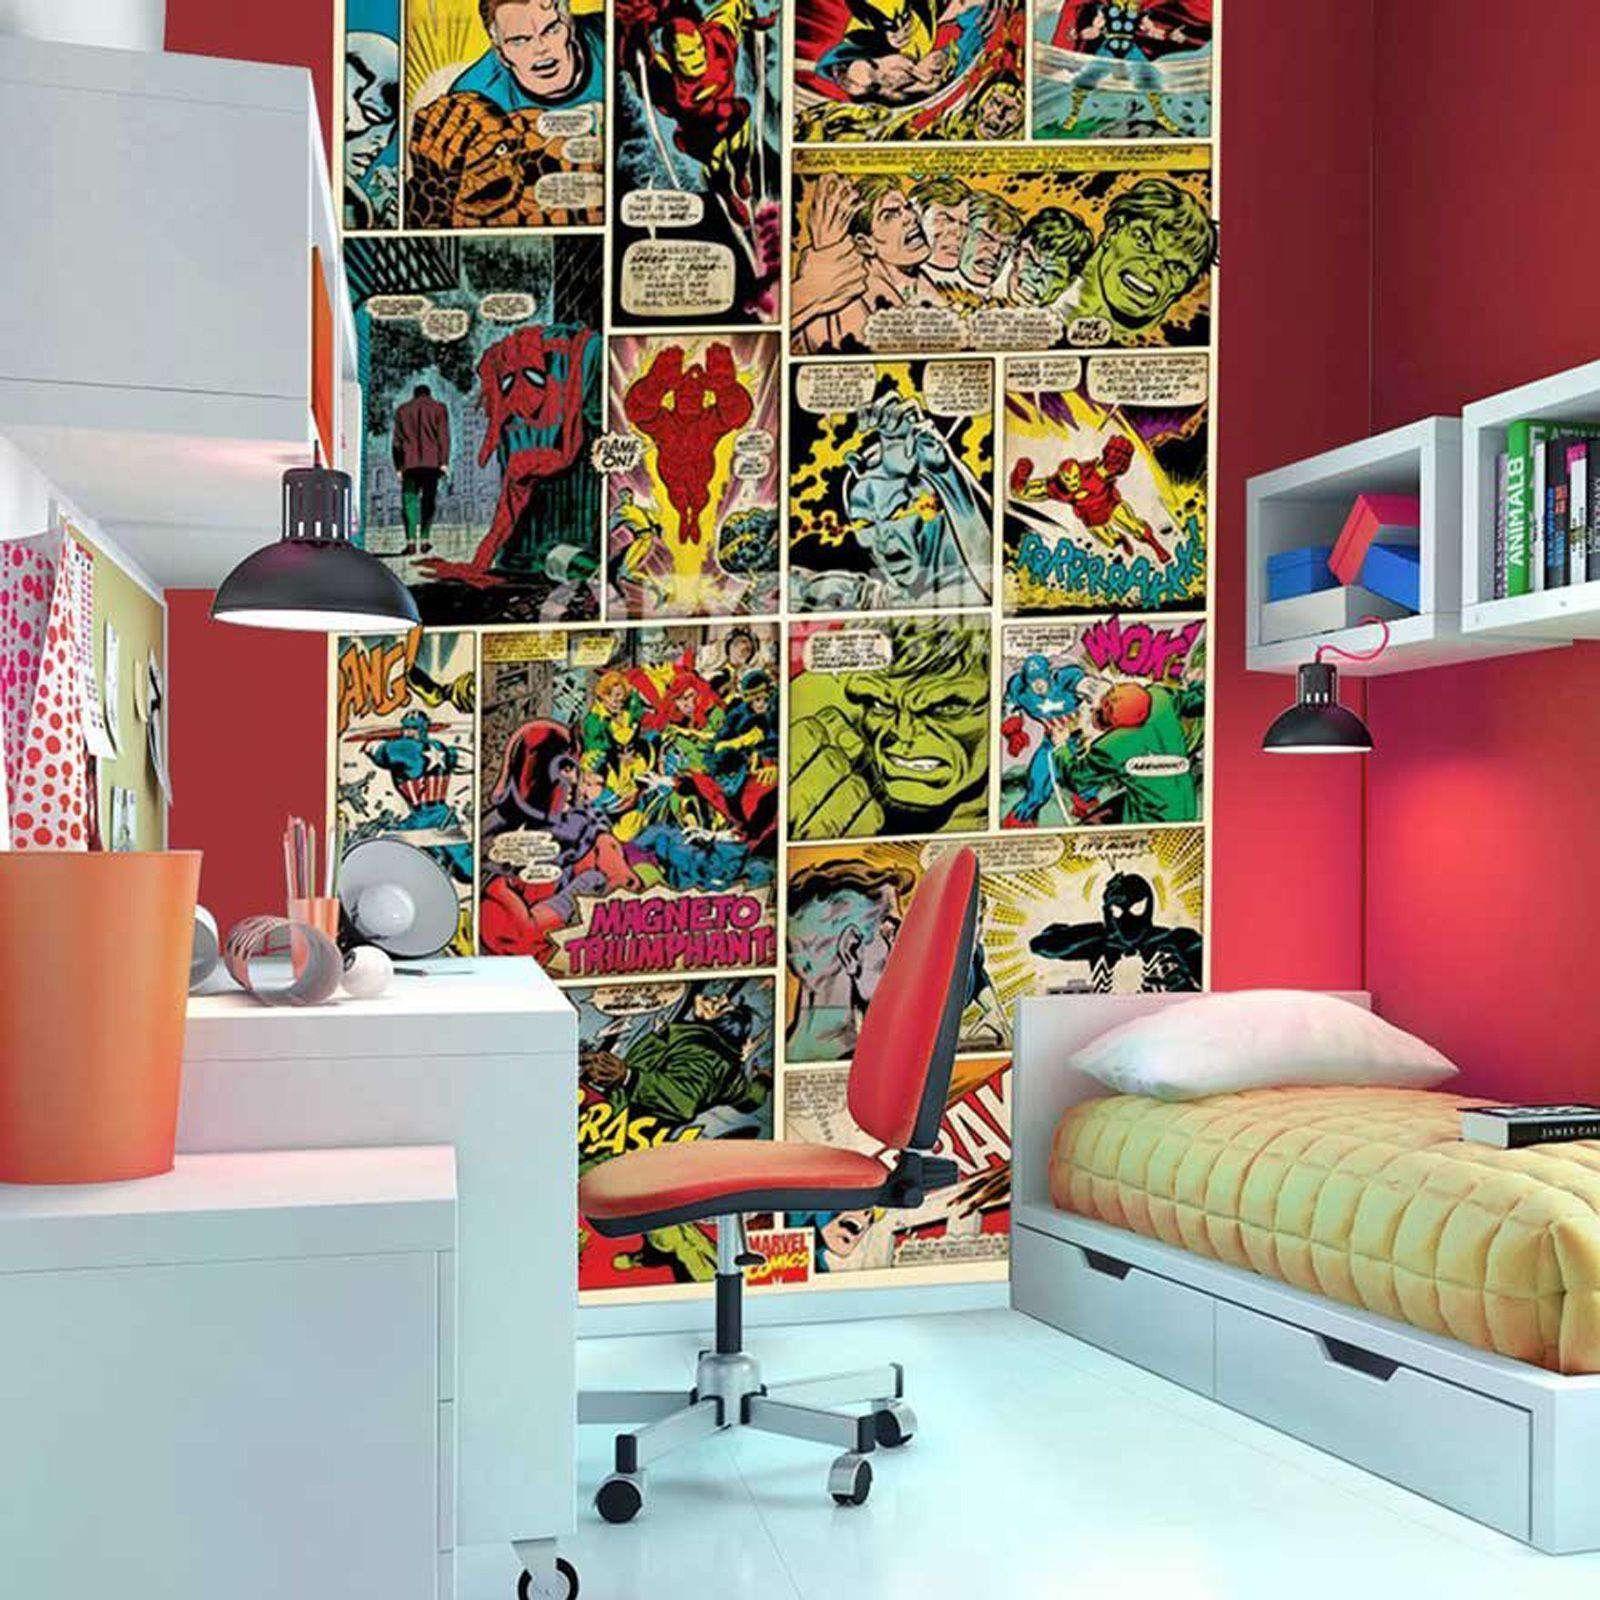 cool marvel wallpaper kids bedroom design inspiration with red wall rh pinterest com